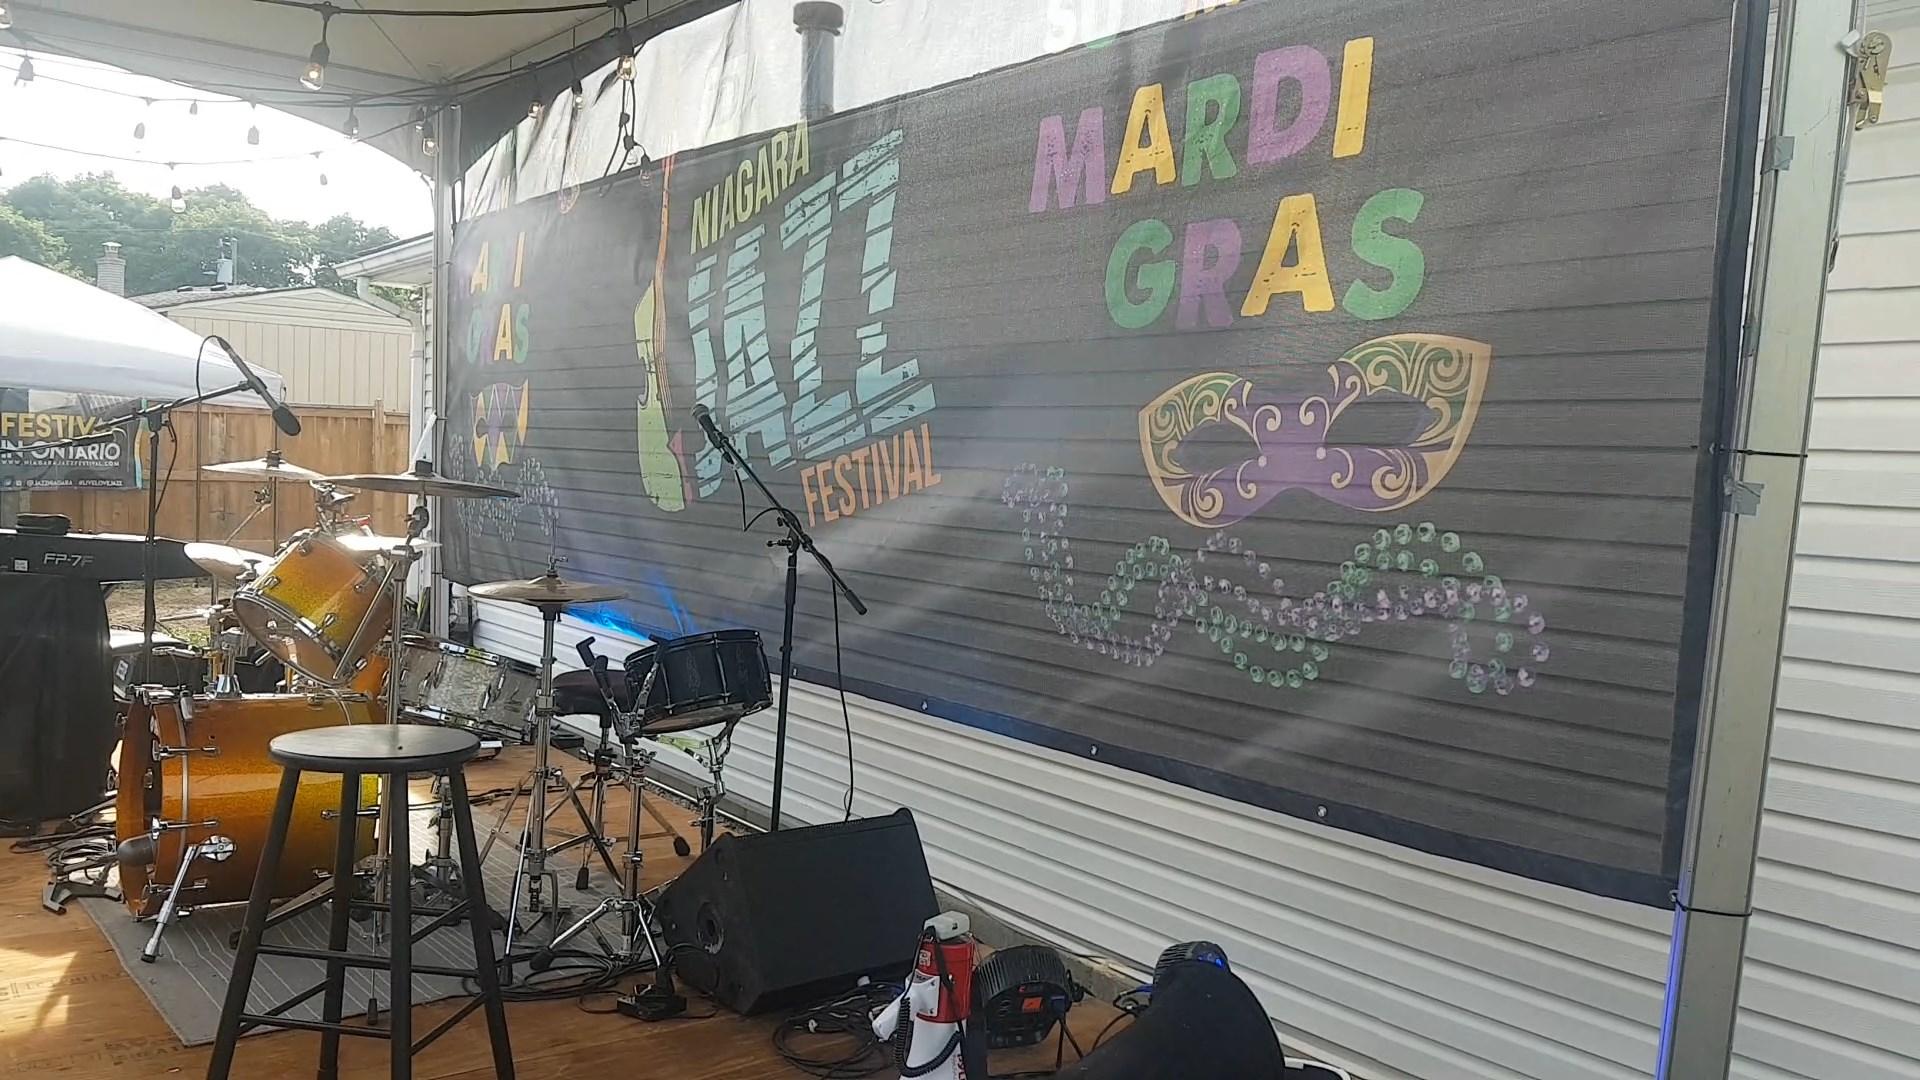 Niagara's ONLINE Summer Mardi Gras - Saturday, July 18, 2020. Photo: Nicholas Paolone